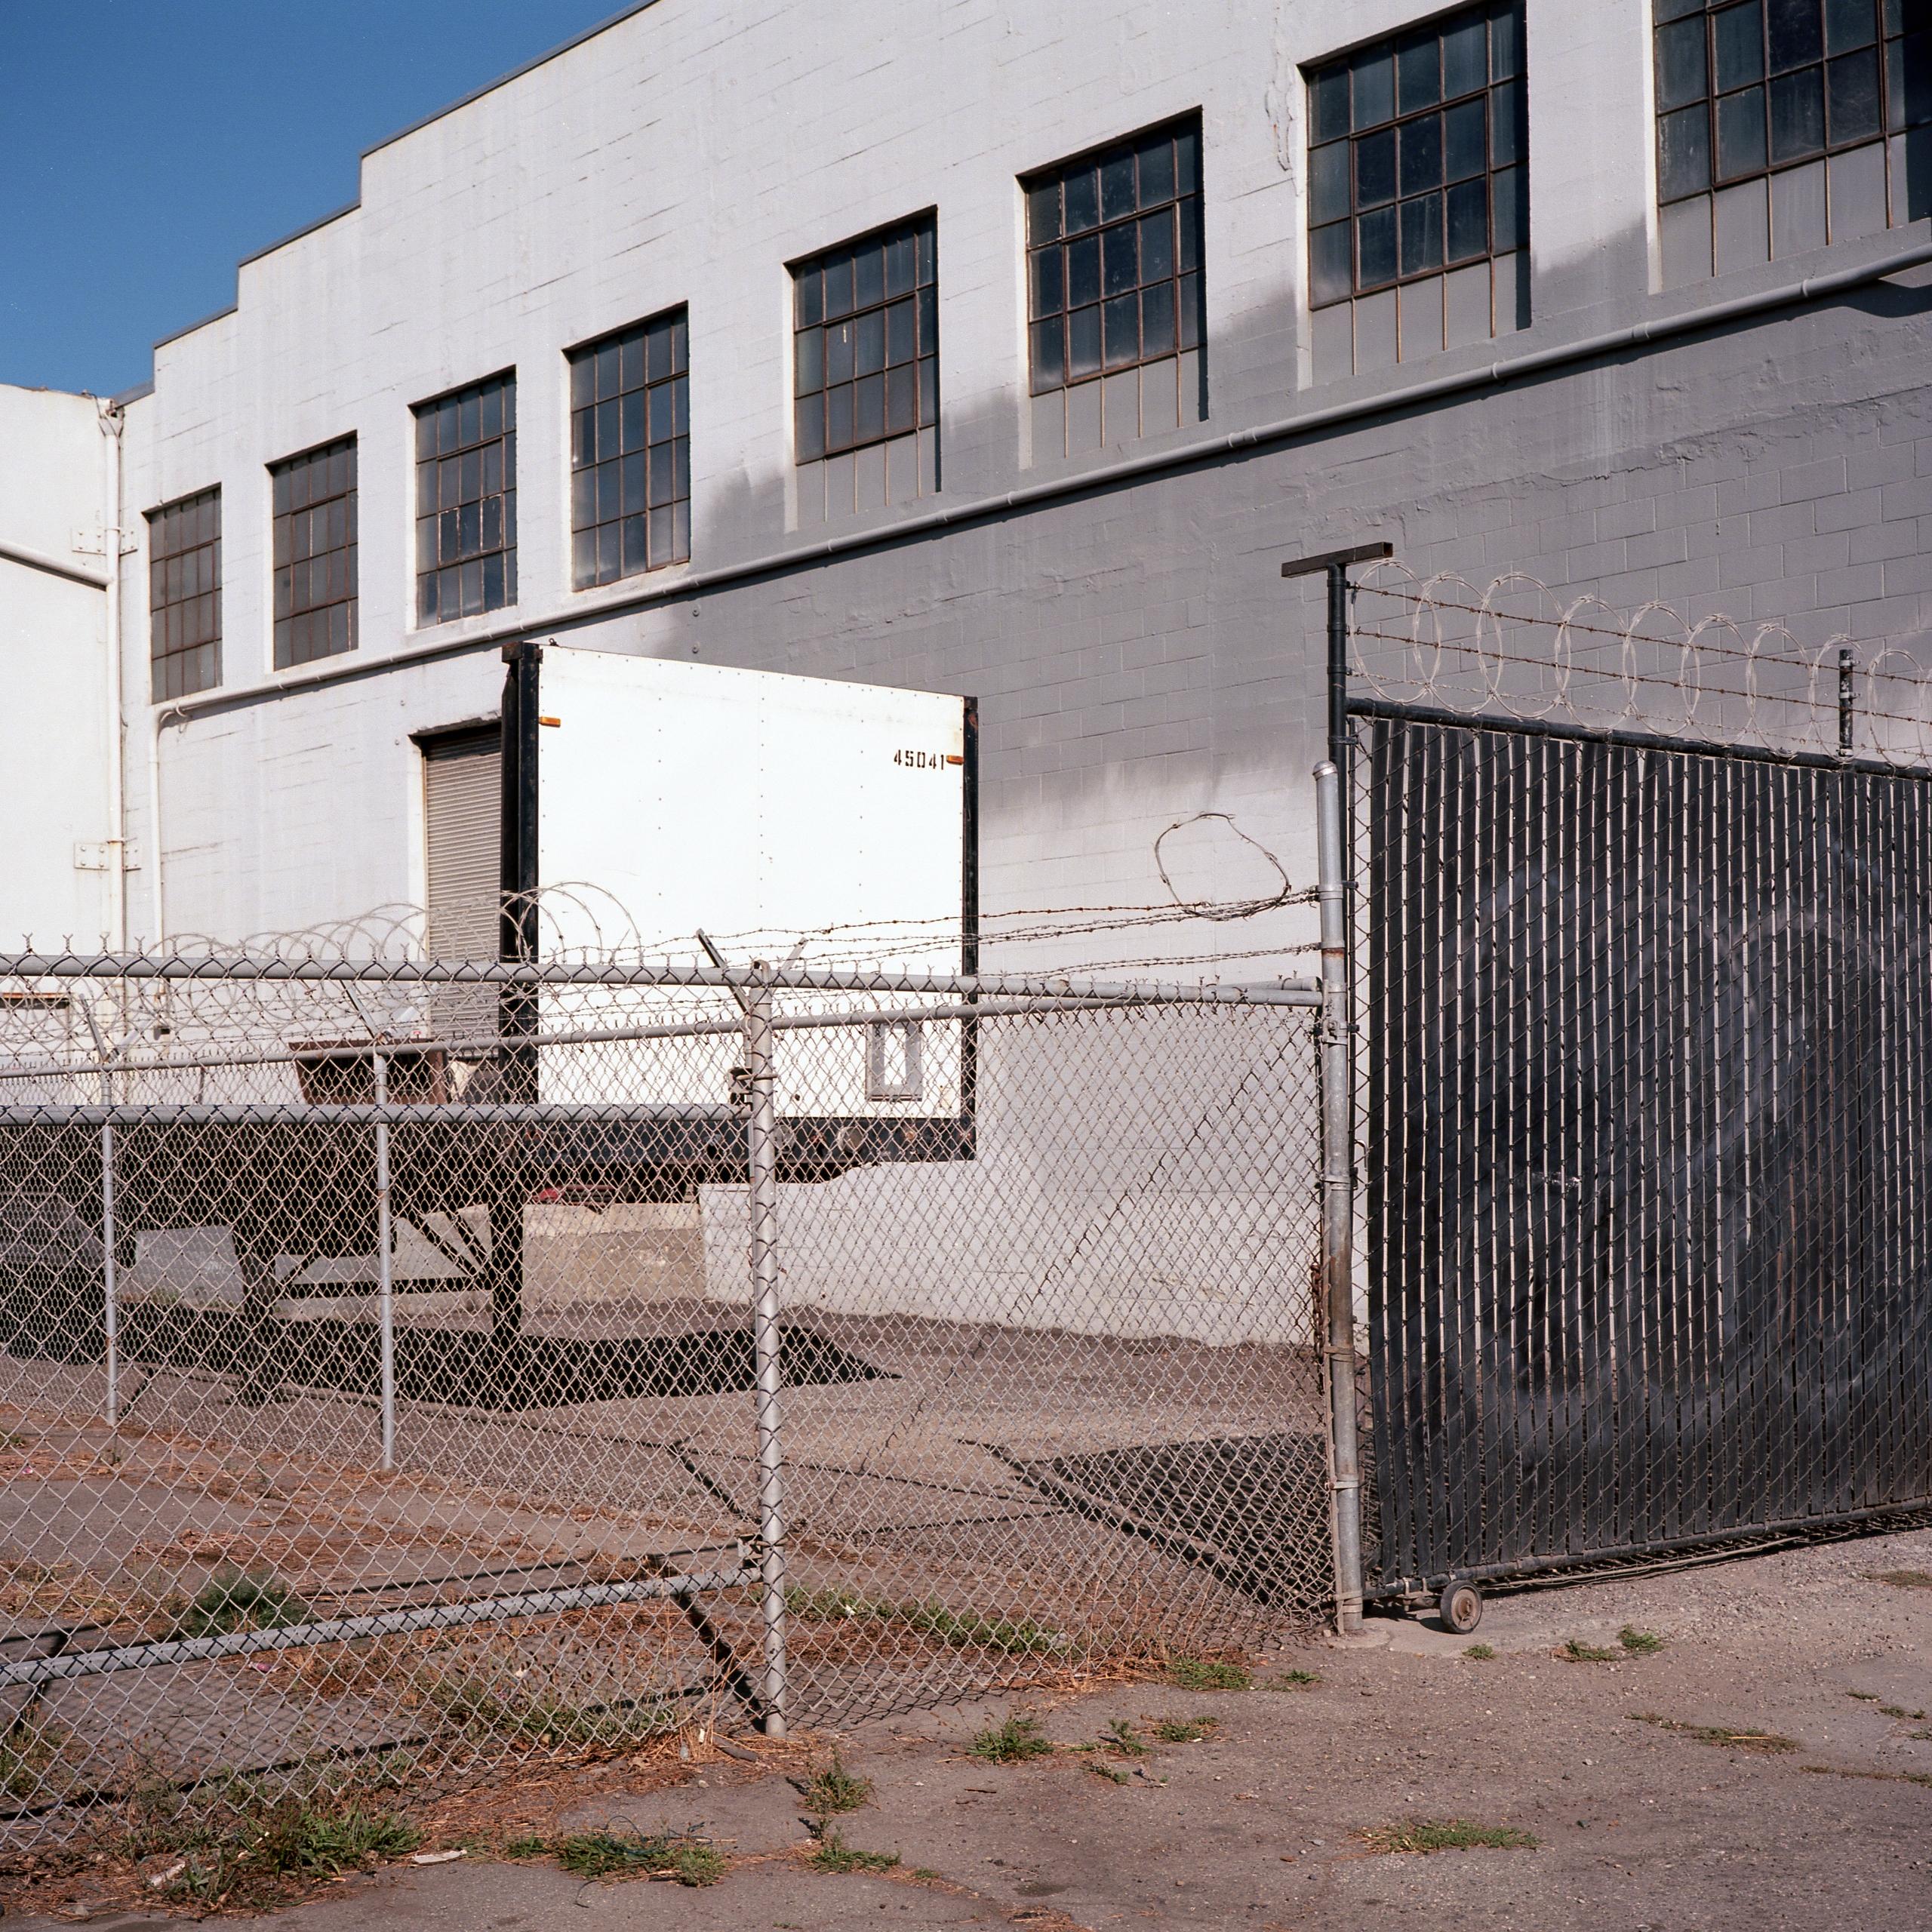 Black white Kodak Ektar 100 Mam - biosfear   ello